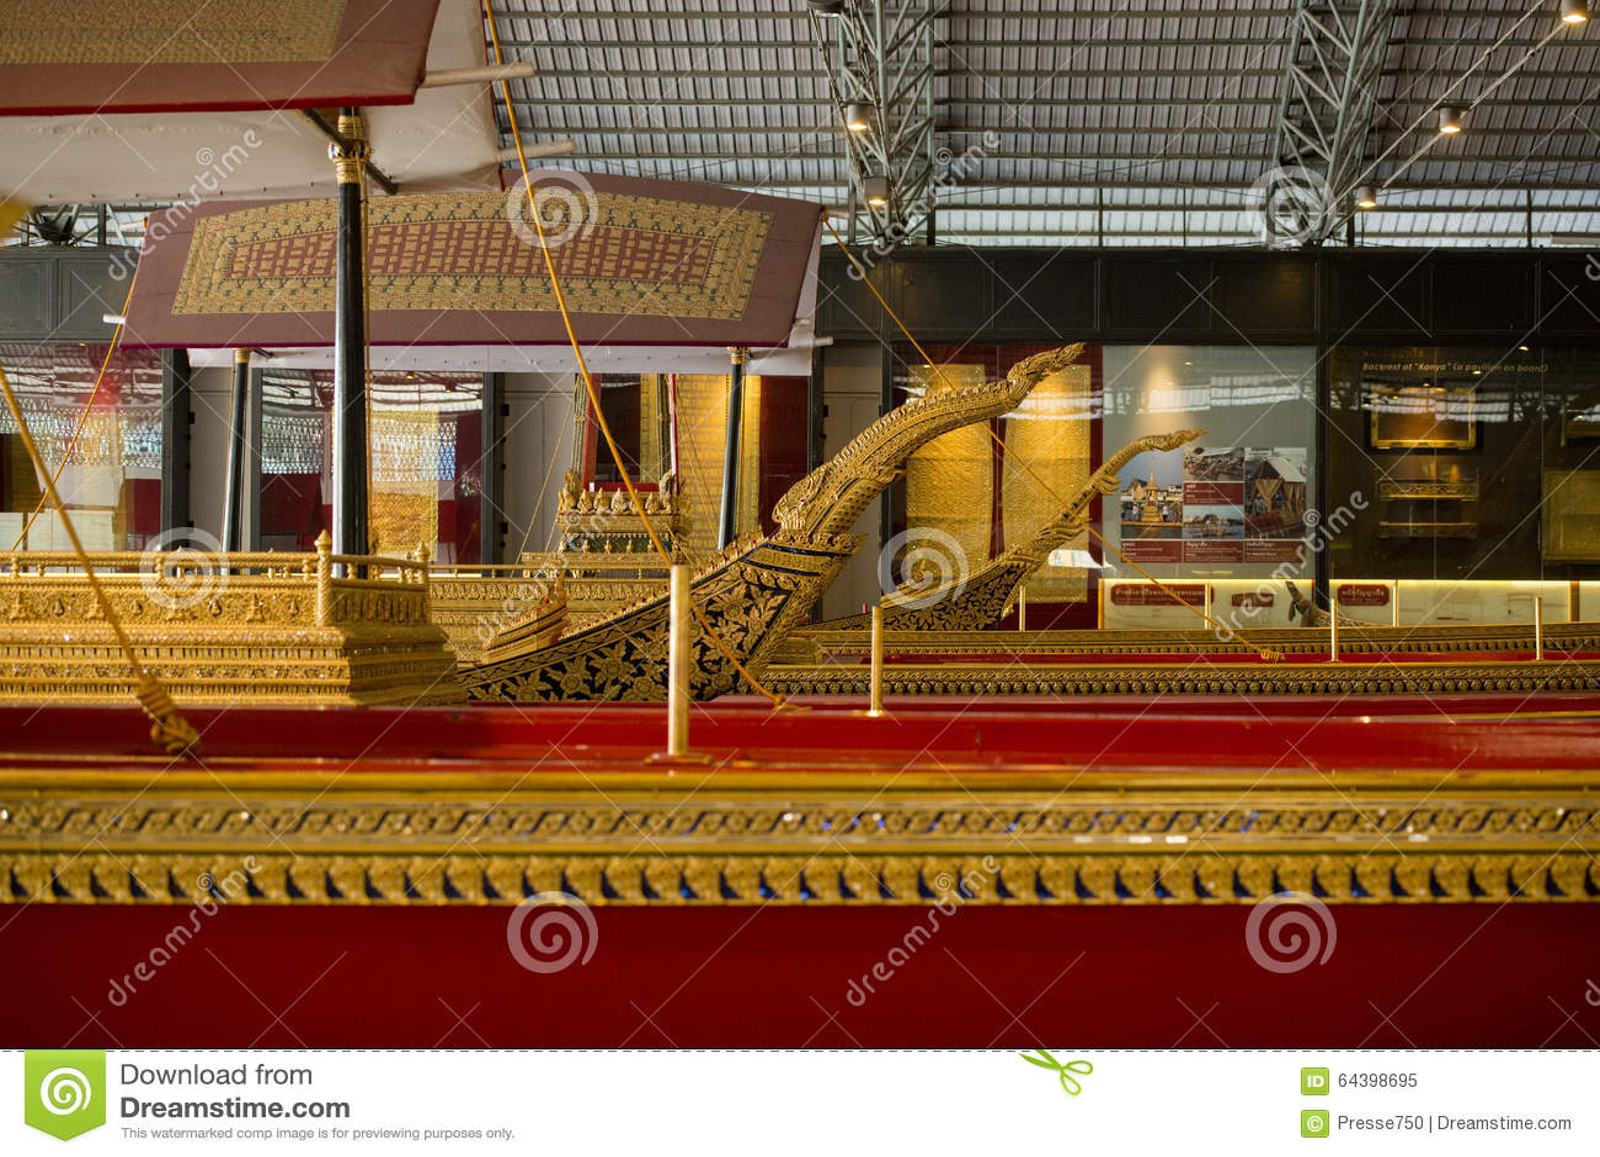 THAILAND BANGKOK ROYAL BARGES NATIONAL MUSEUM Editorial Image - Image: 64398695